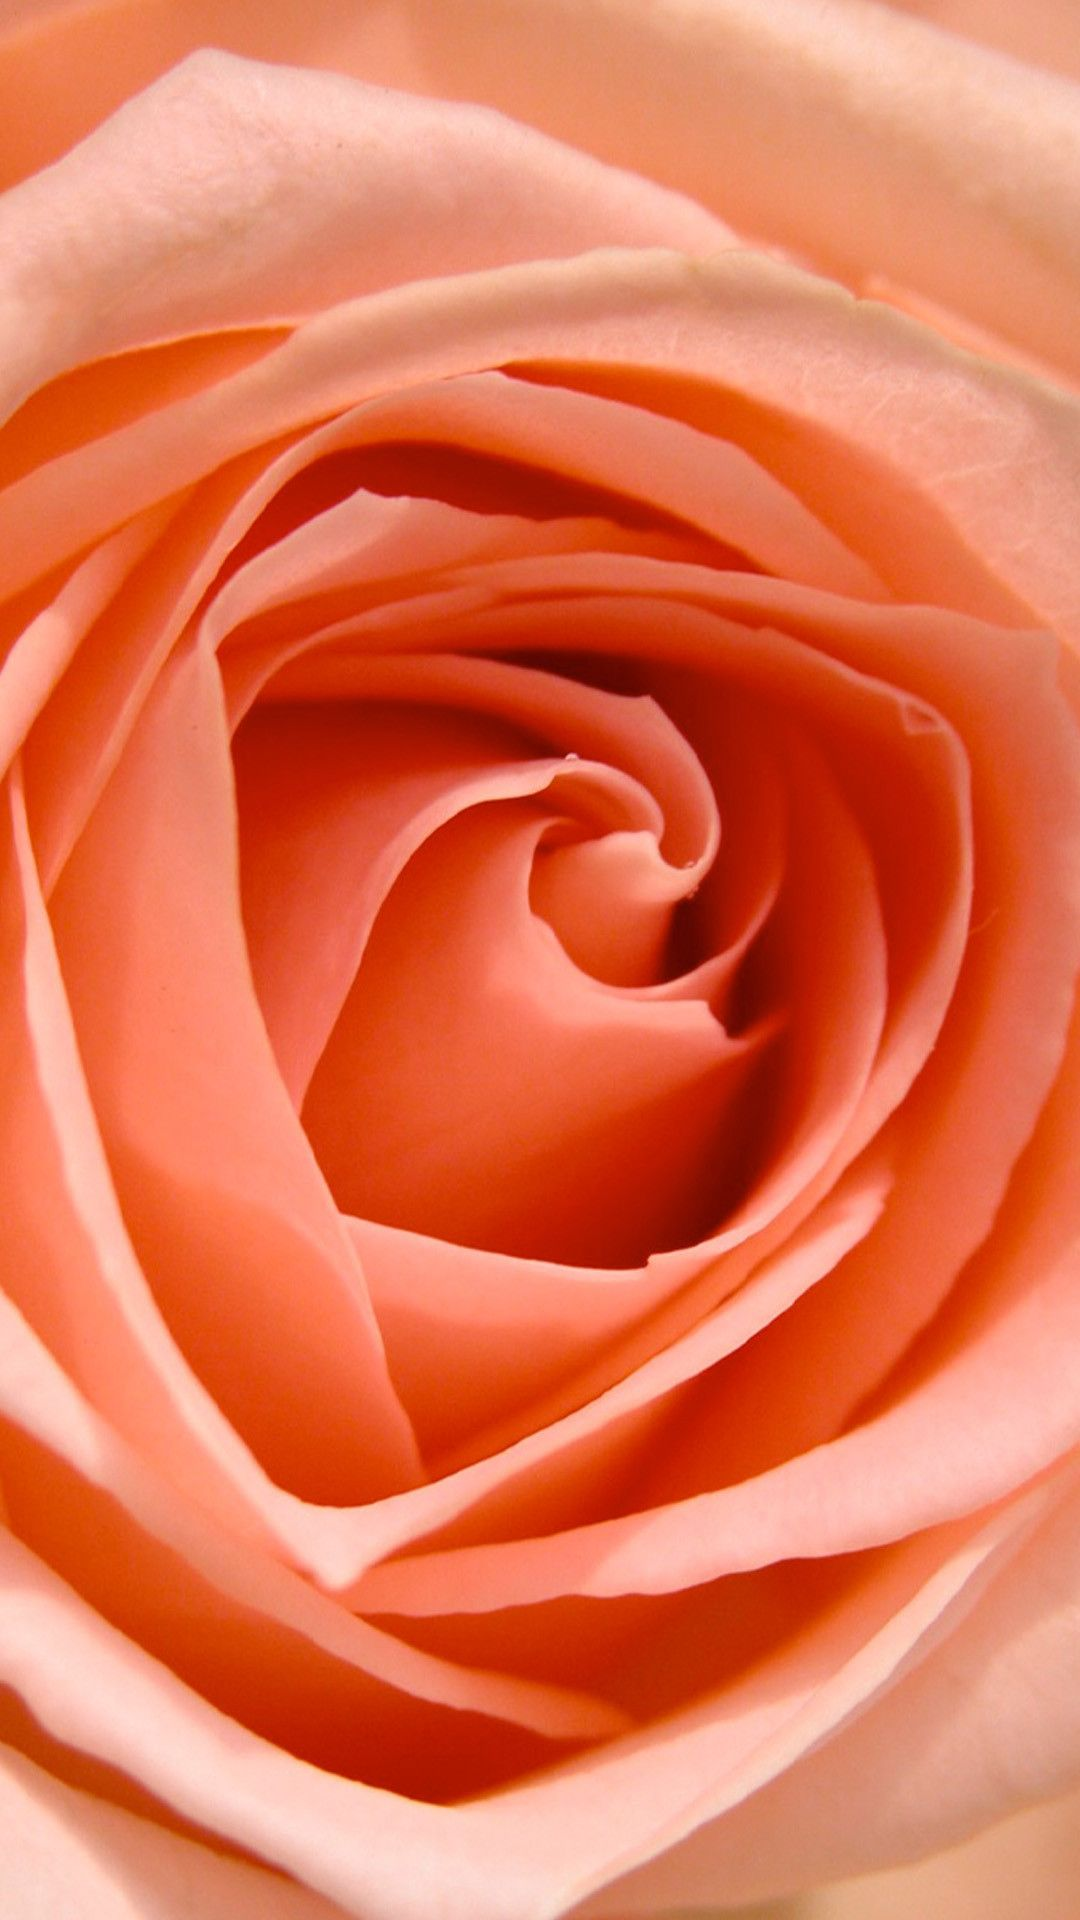 GONE FLORAL Coral Rose Print Flower phone wallpaper